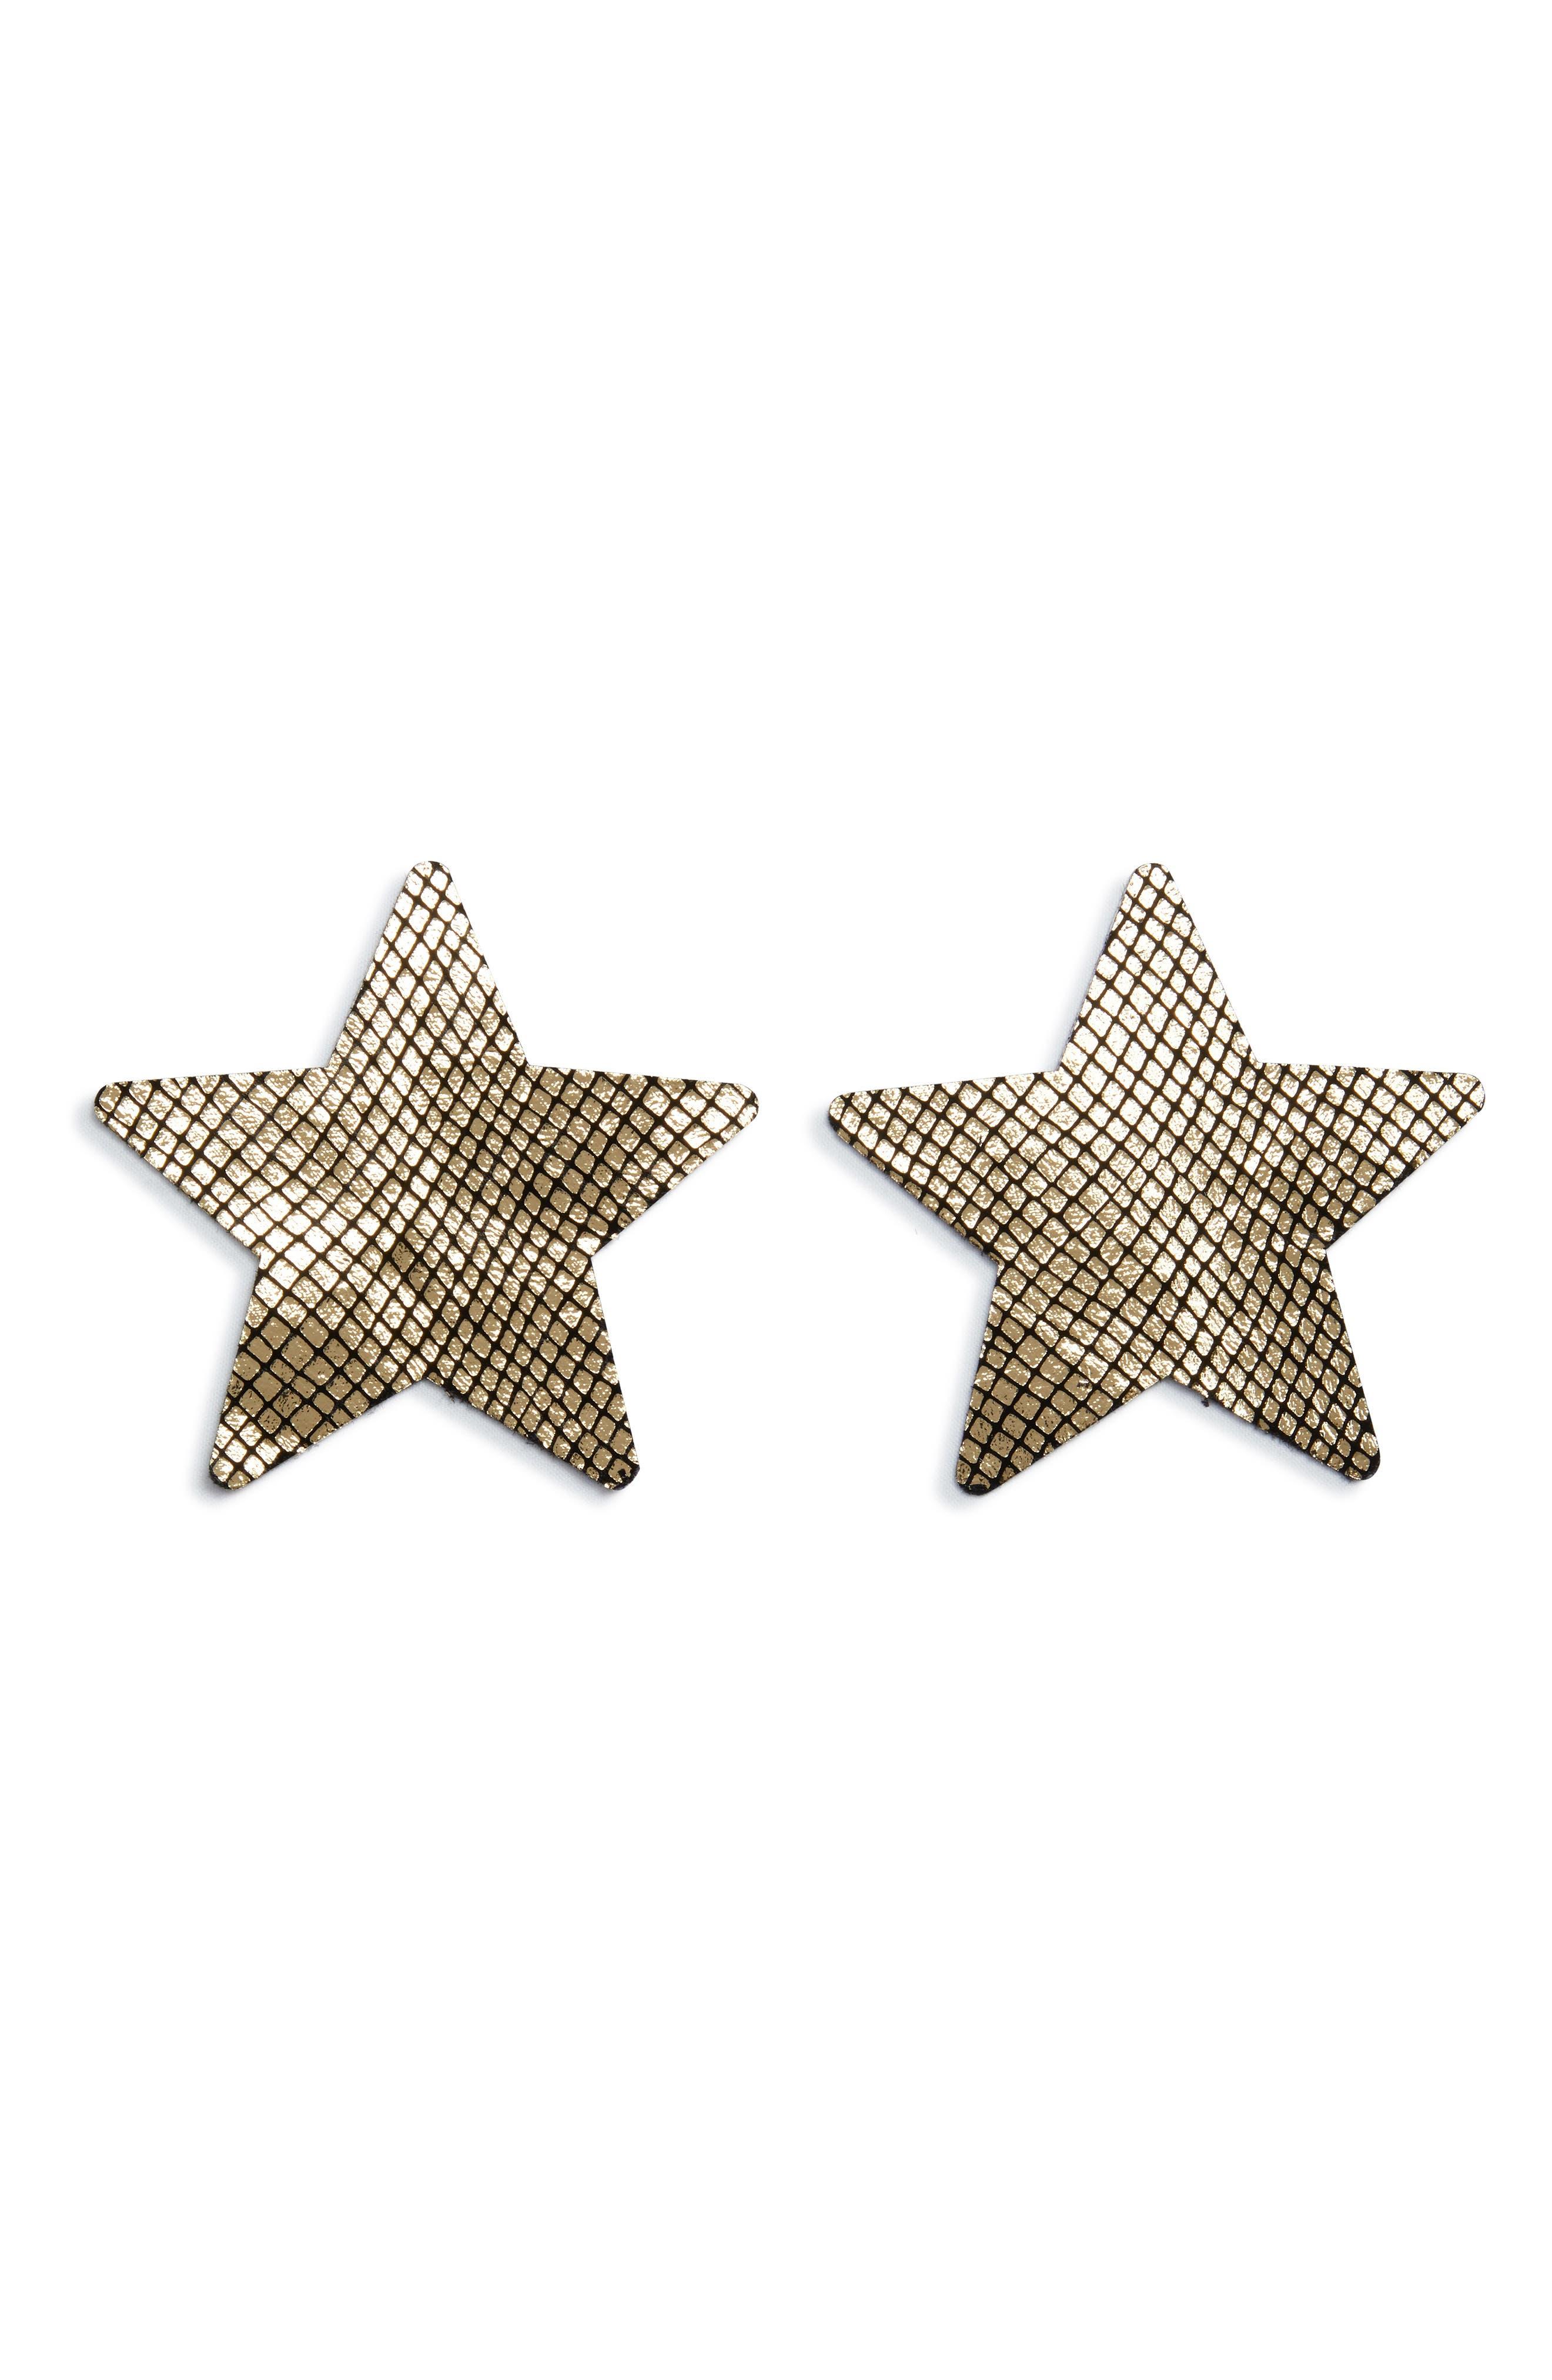 Nippies by Bristols Fishnet Star Nipple Covers